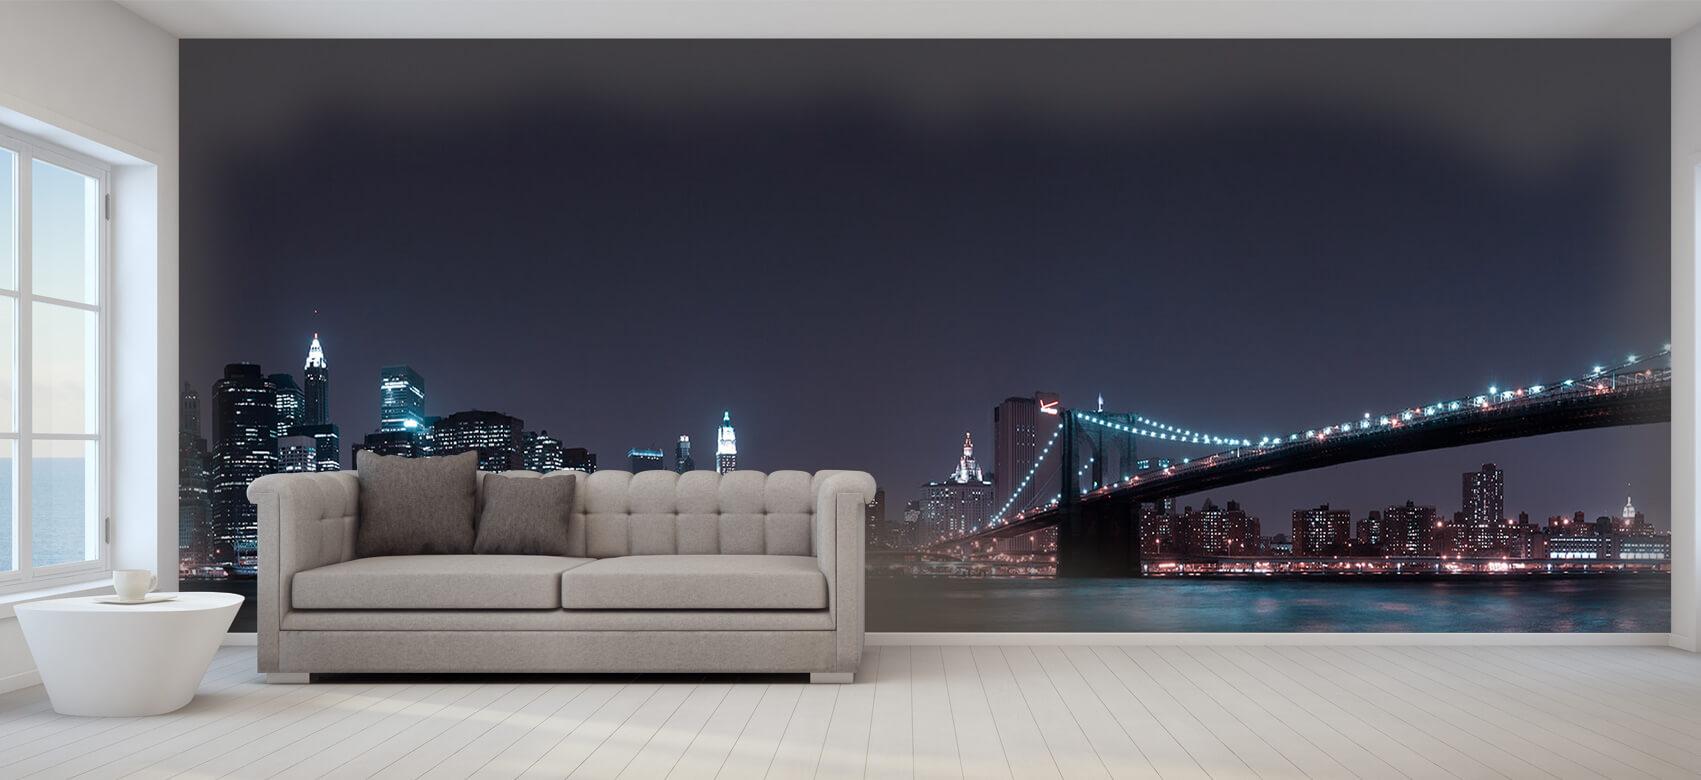 Nacht Manhattan Skyline and Brooklyn Bridge 8